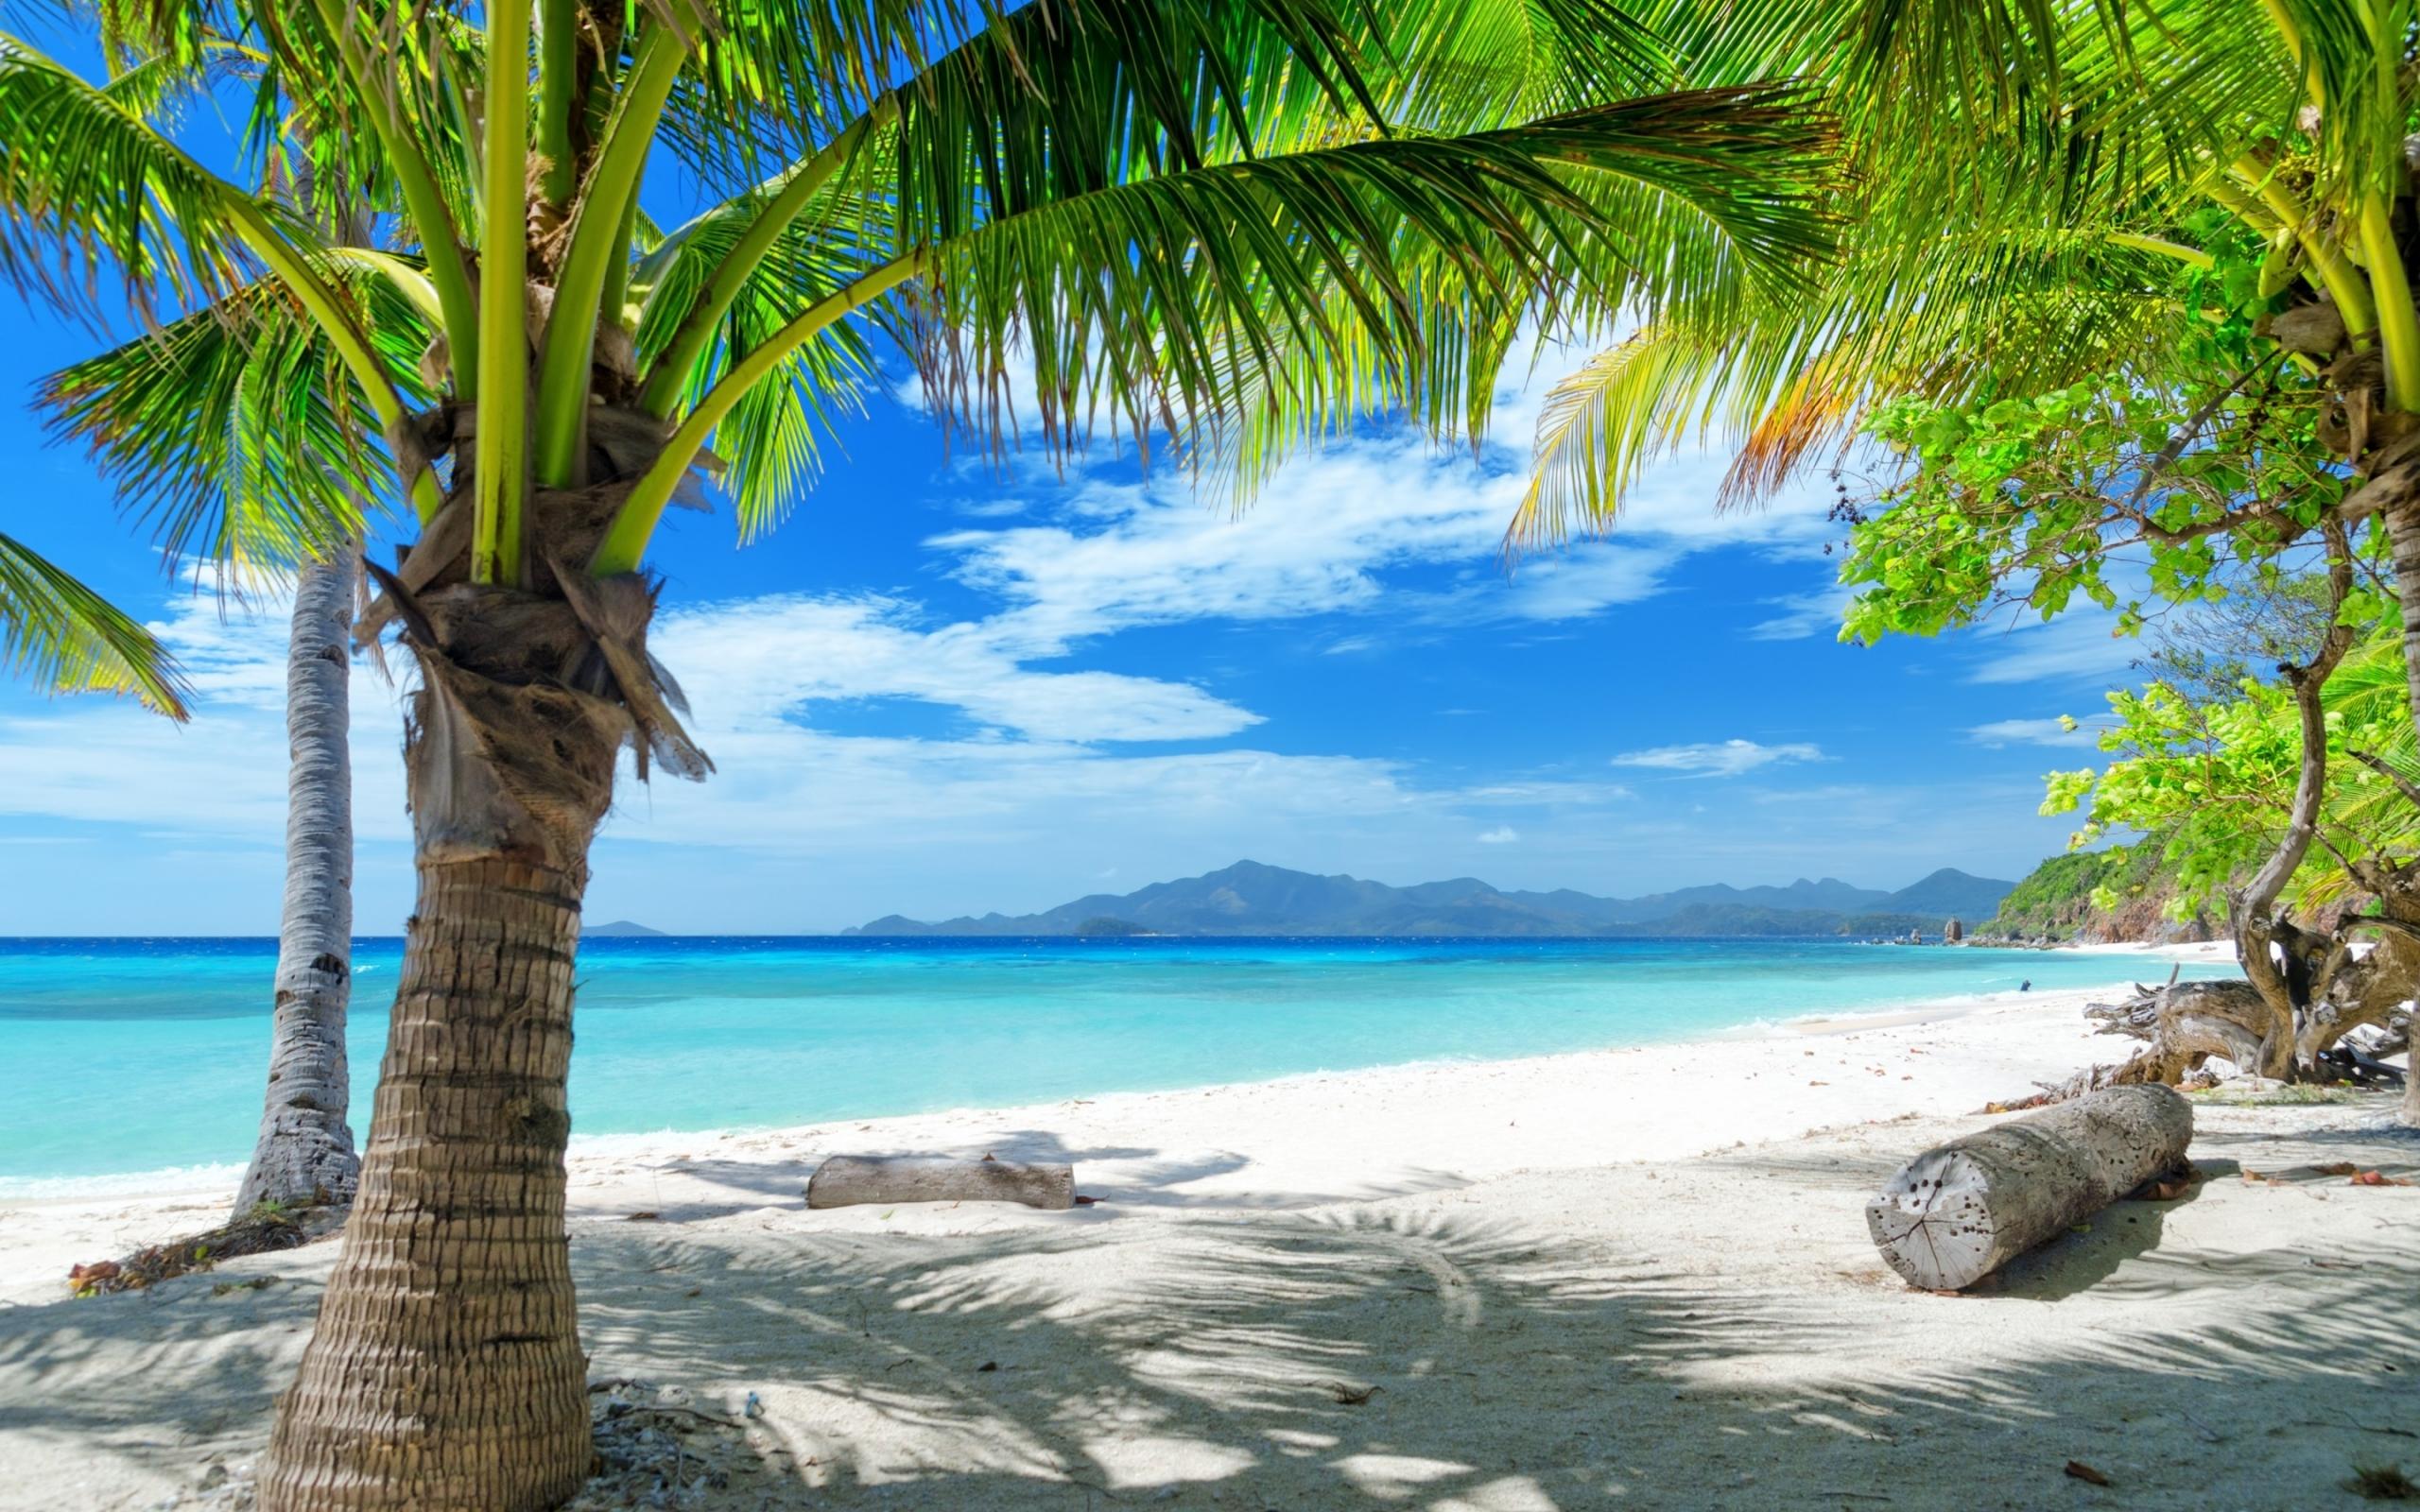 beach with palm trees HD Desktop Wallpaper HD Desktop Wallpaper 2560x1600